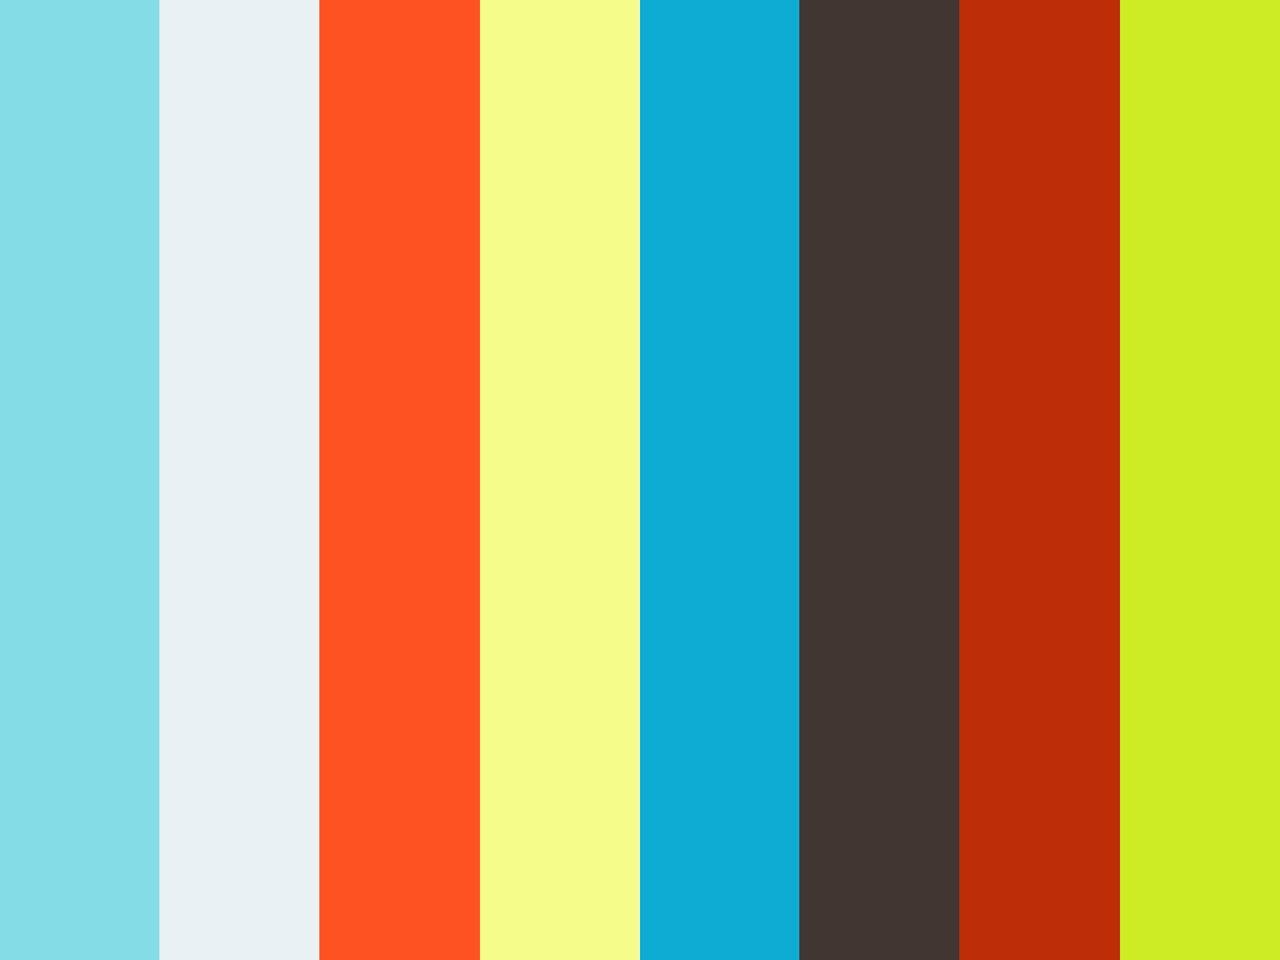 AtomTV : Denderhoutem bij Ninove ?